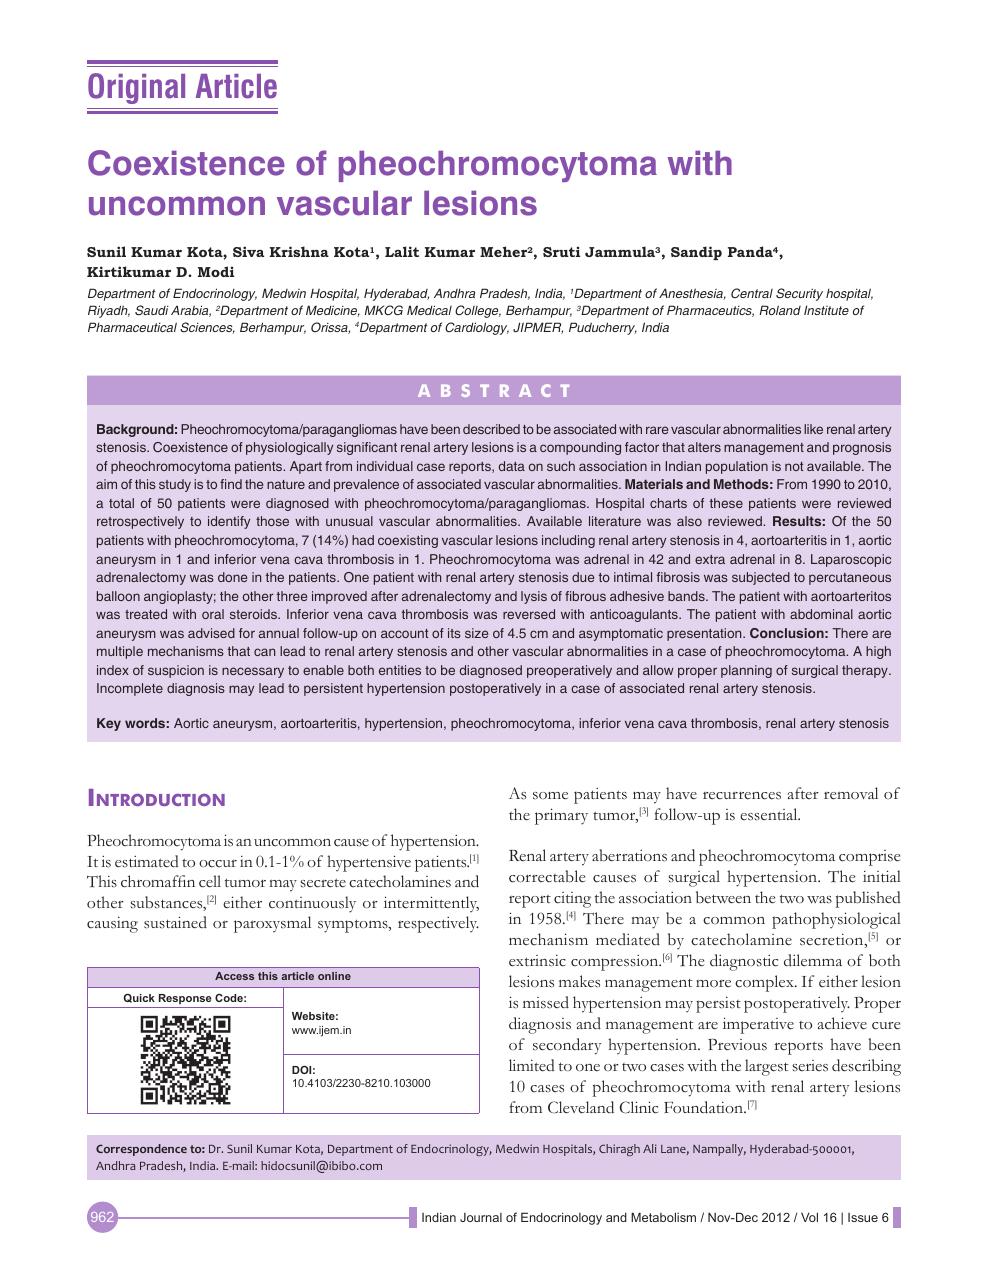 Coexistence of pheochromocytoma with uncommon vascular